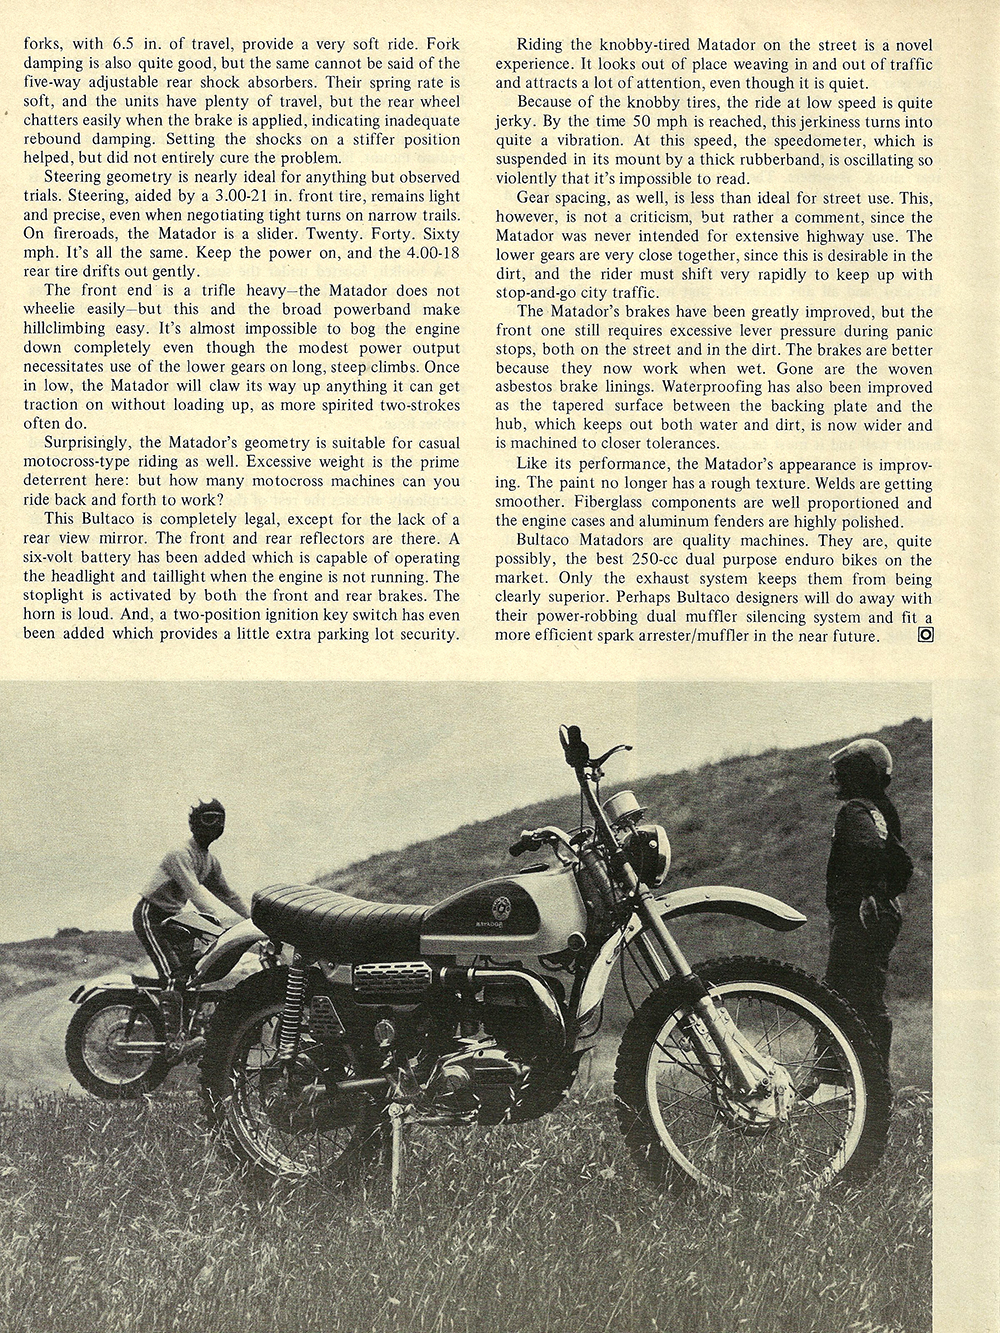 1971 Bultaco Matador 250 road test 03.jpg